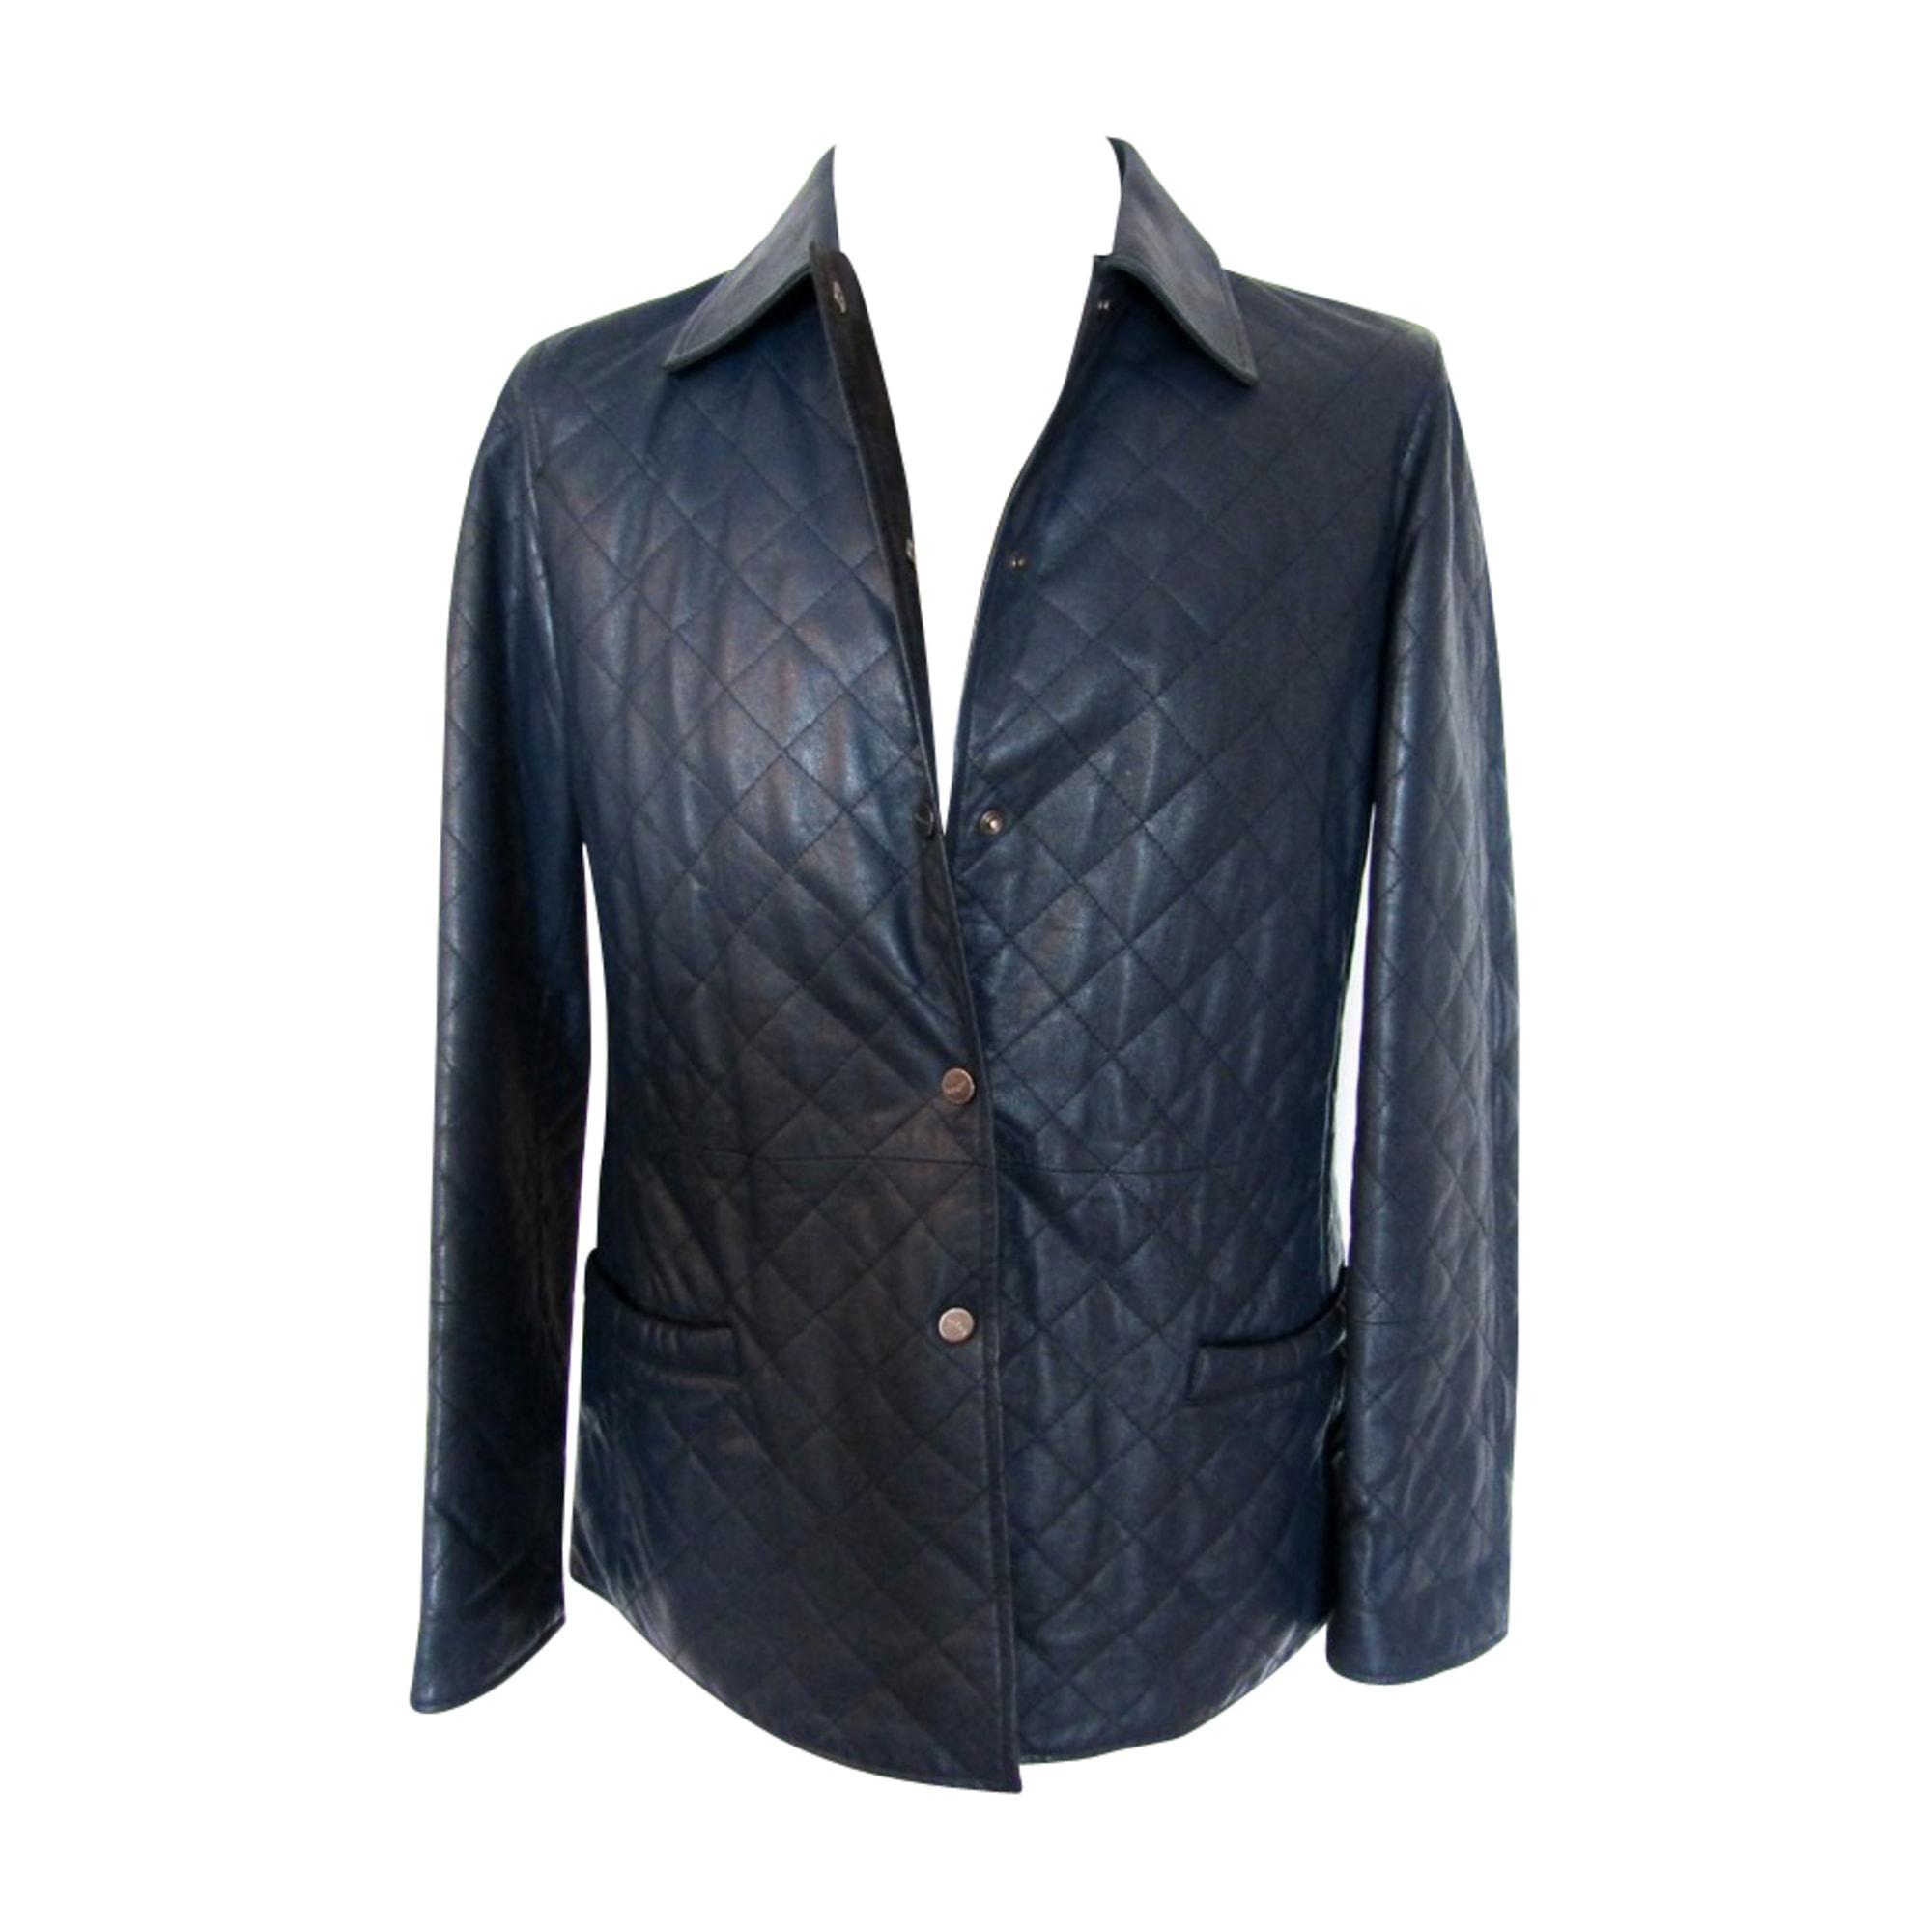 Veste en cuir SALVATORE FERRAGAMO Bleu, bleu marine, bleu turquoise